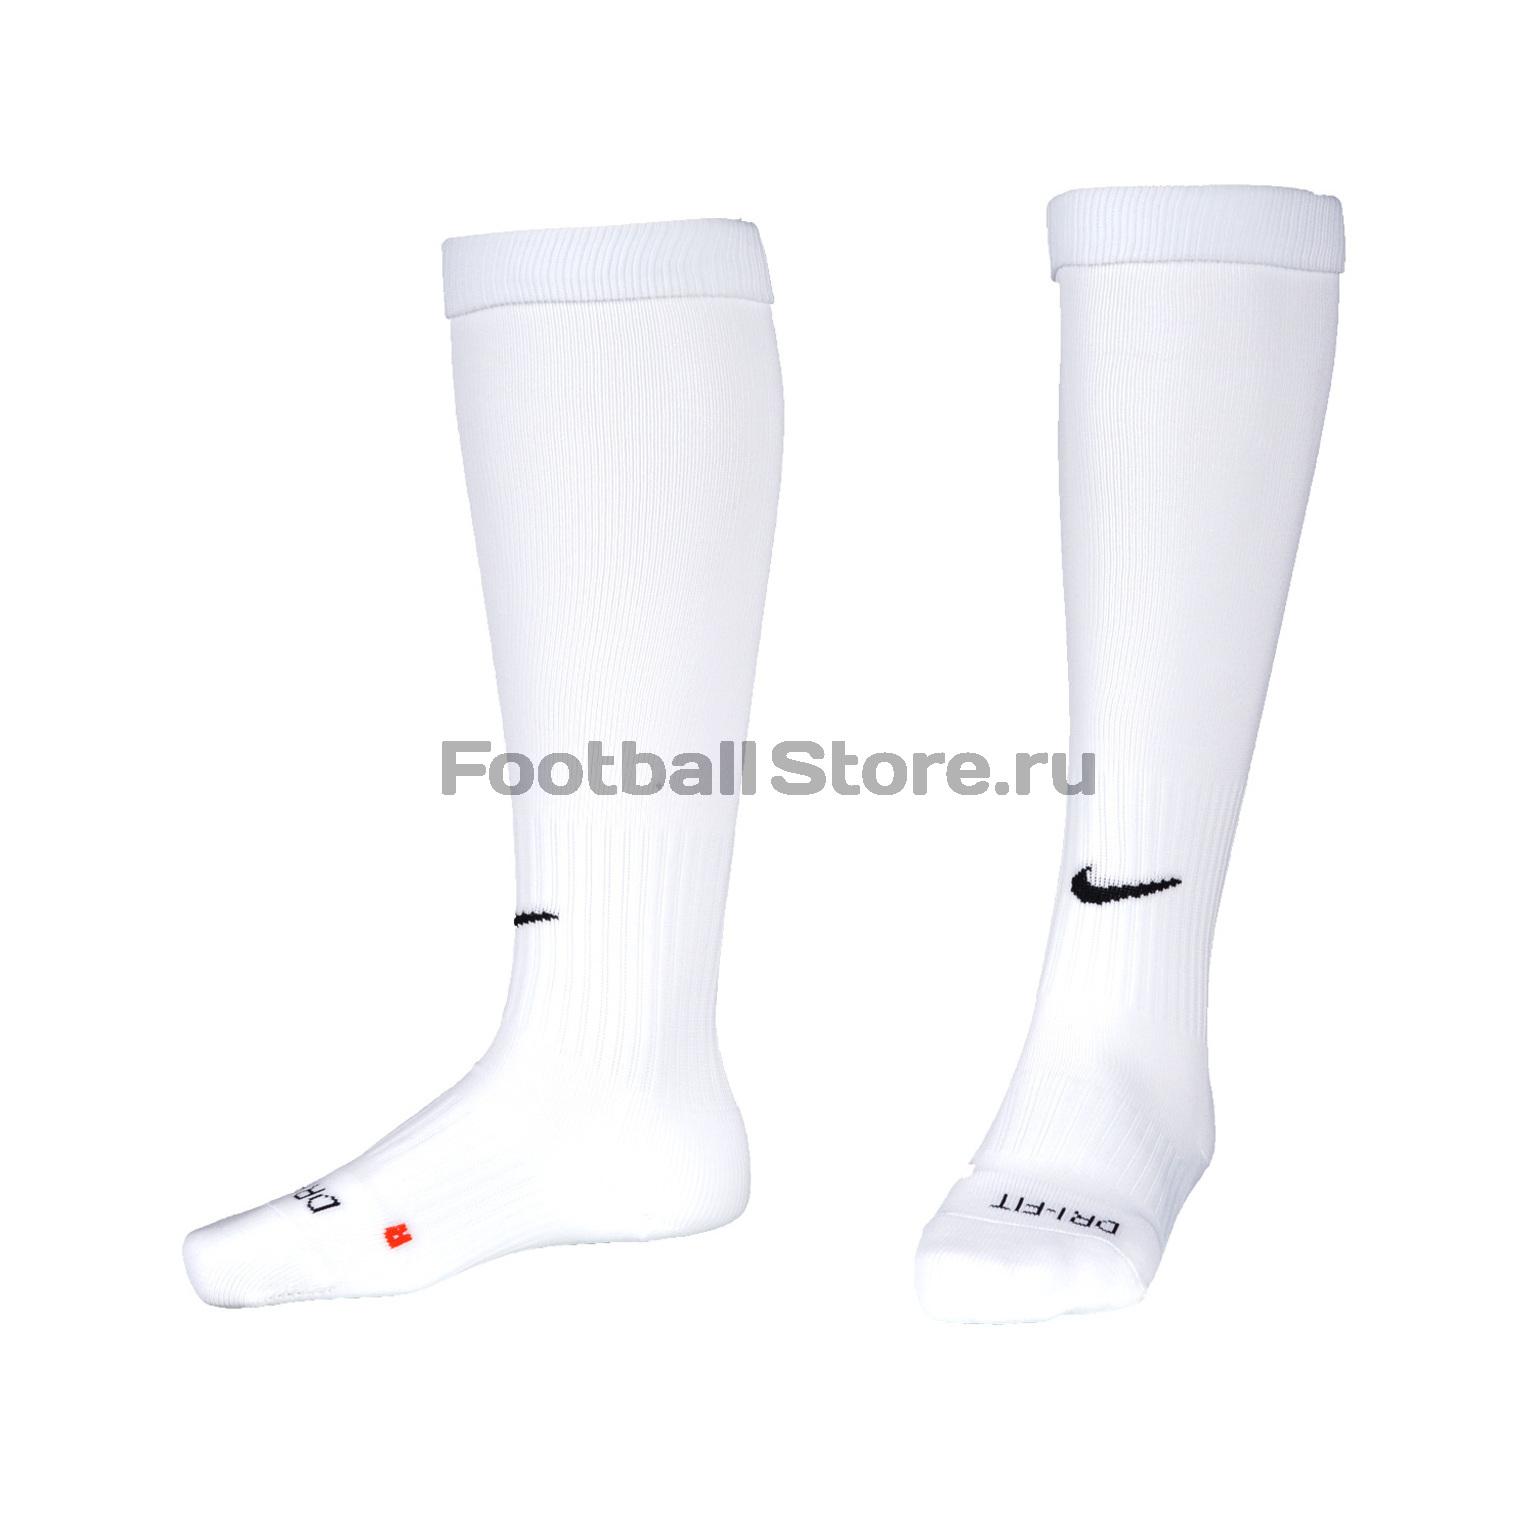 Гетры Nike Classic Football Dri-Fit SX4120-101 лонгслив nike лонгслив dri fit contour long sleeve